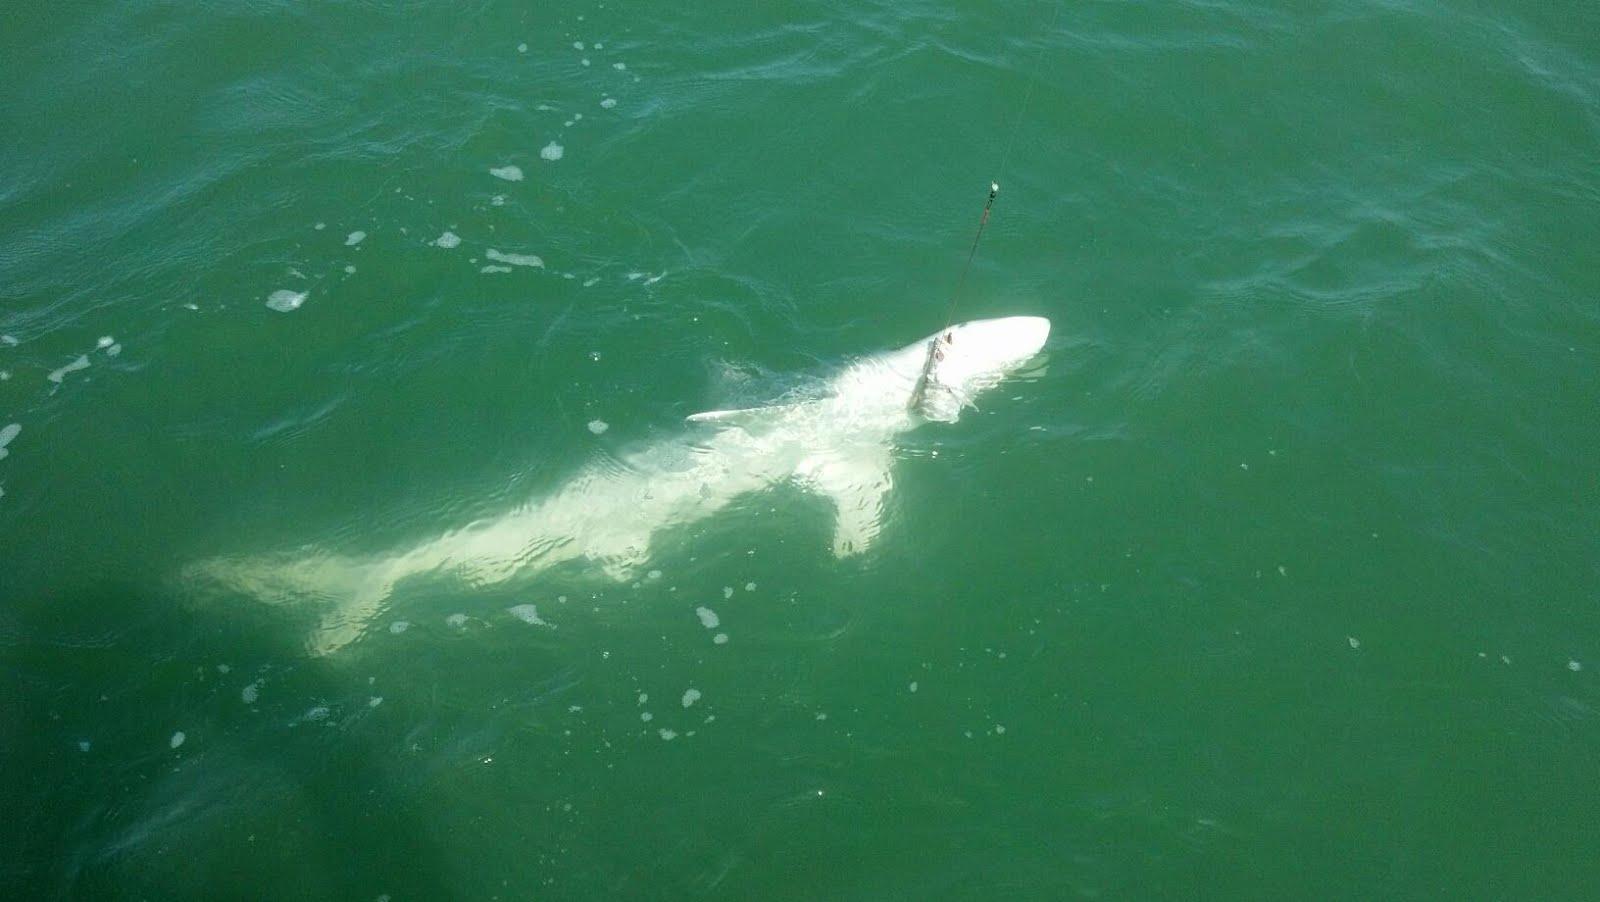 Galveston bay texas and sabine lake fishing reports 06 10 for Texas shark fishing